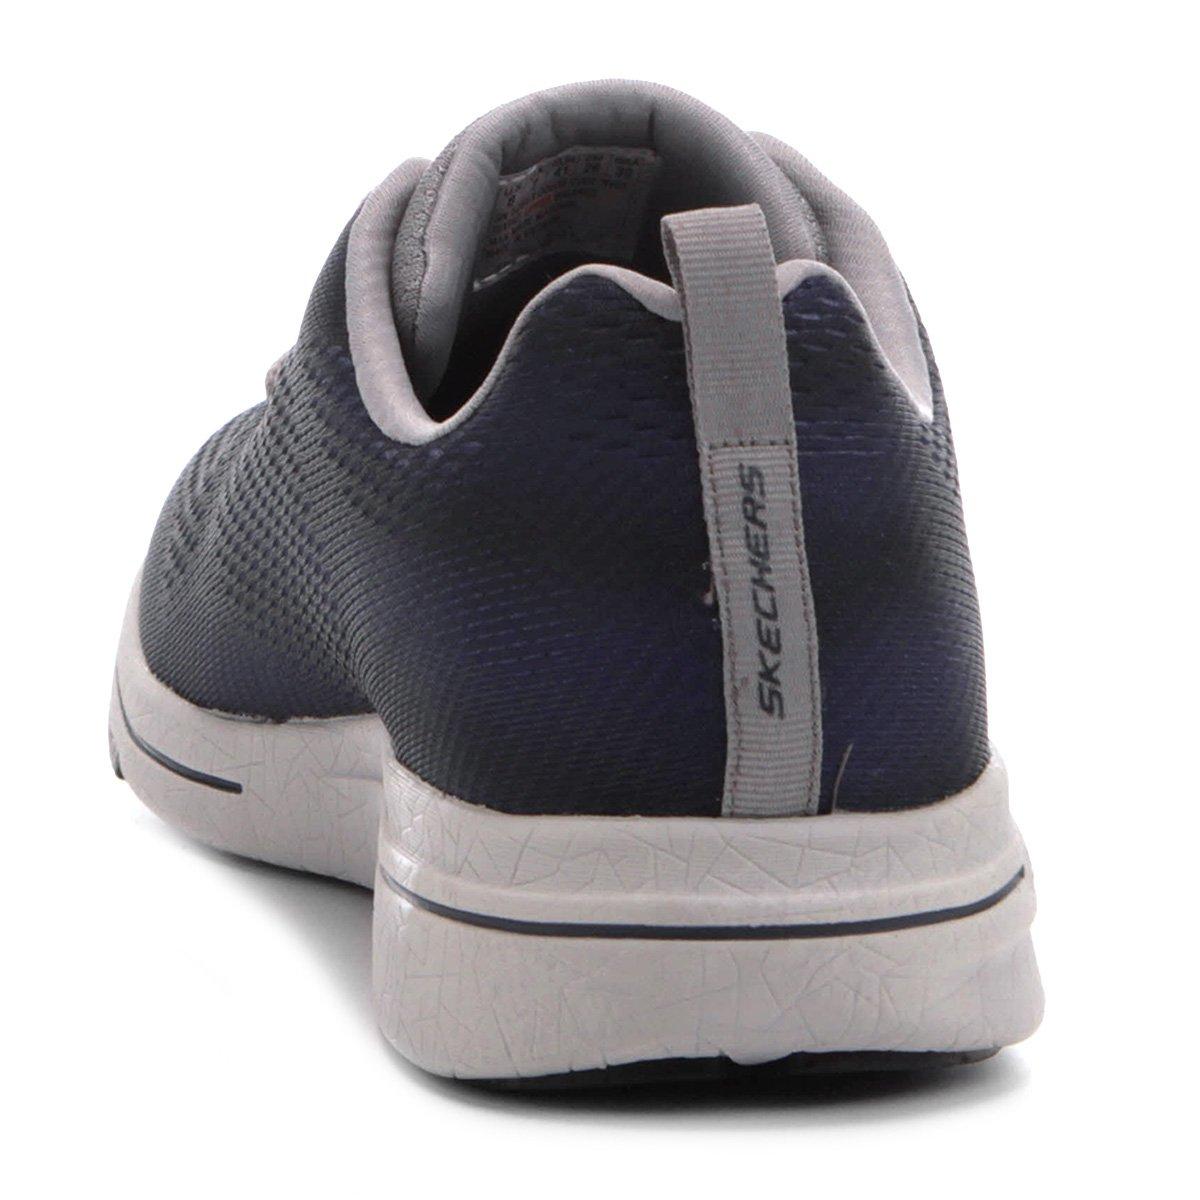 1bb8833ad Tênis Skechers Burst 2.0 Debore Masculino - Shopping TudoAzul